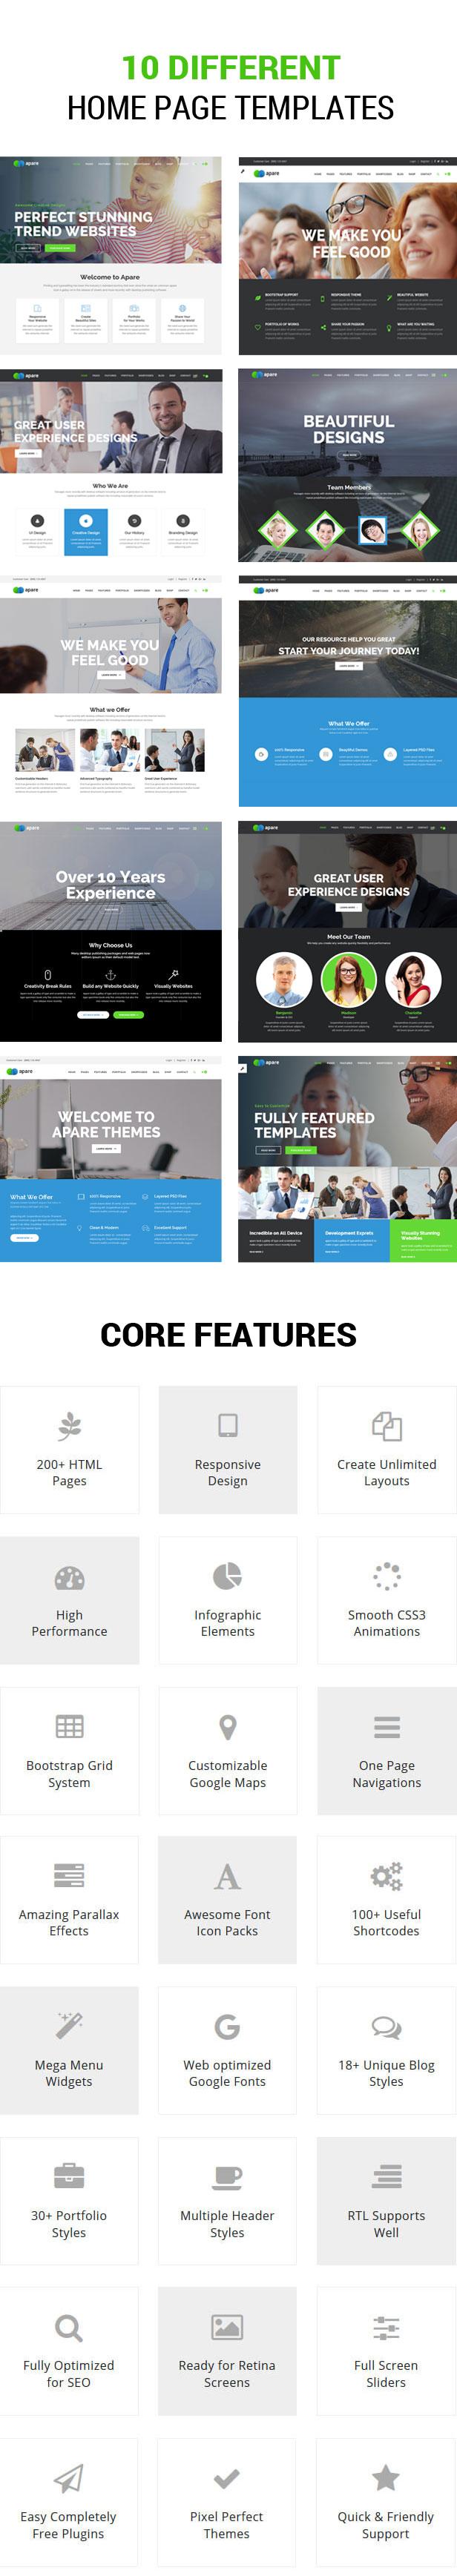 Apare - Responsive Multipurpose HTML5 Template - 3